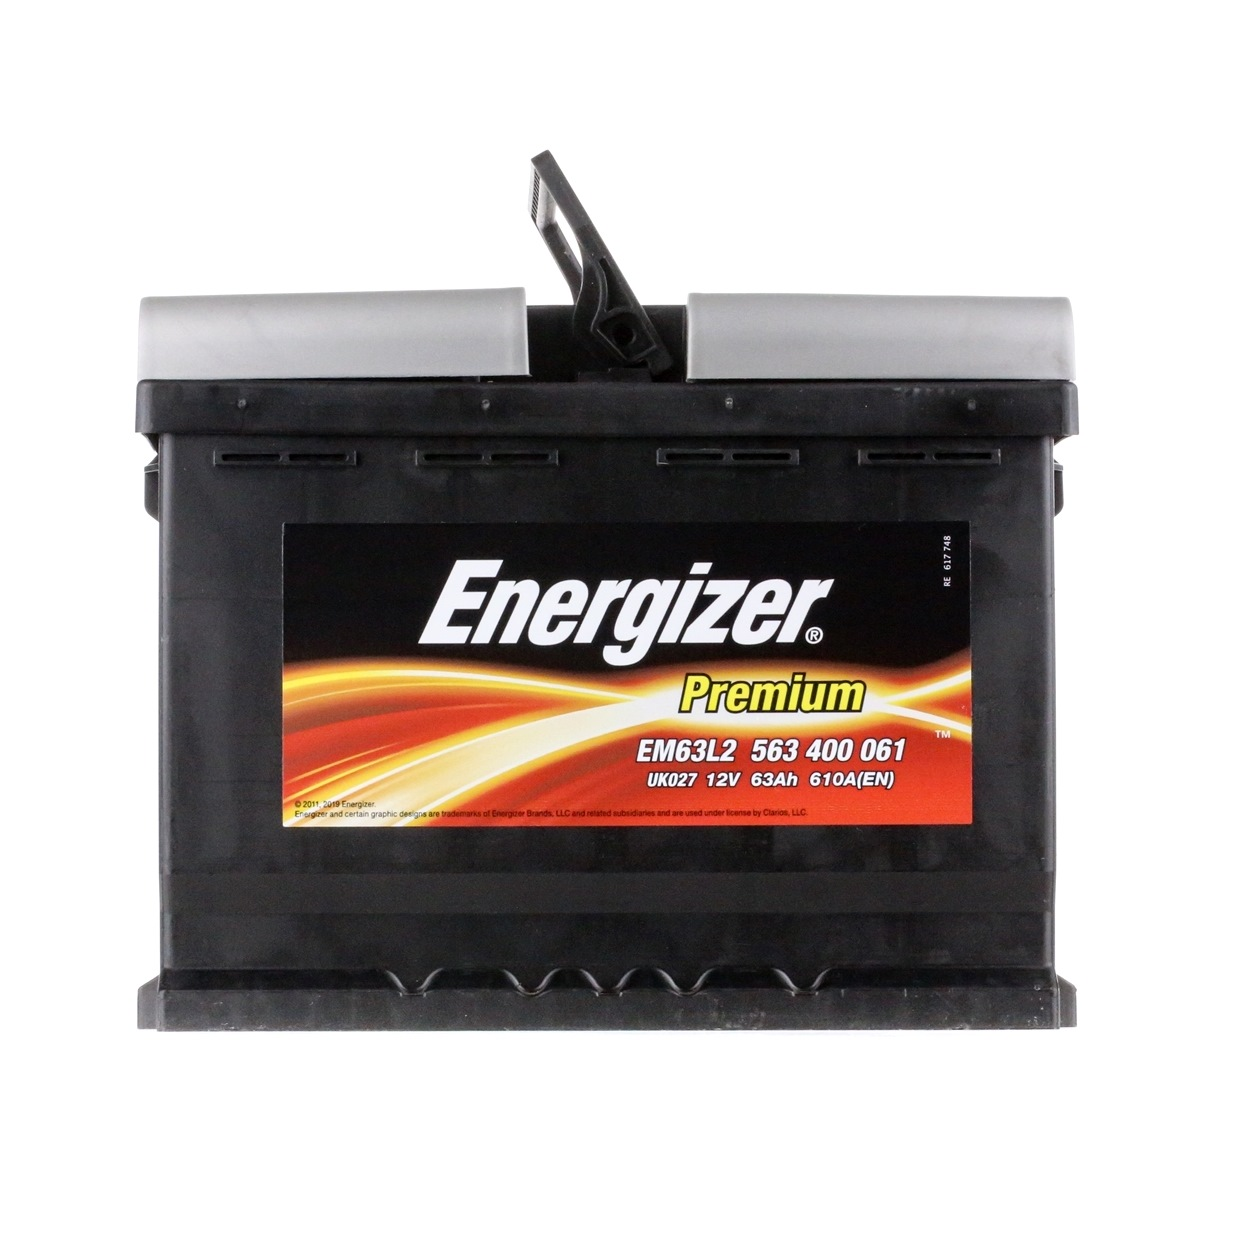 Akku ENERGIZER 027 Bewertung